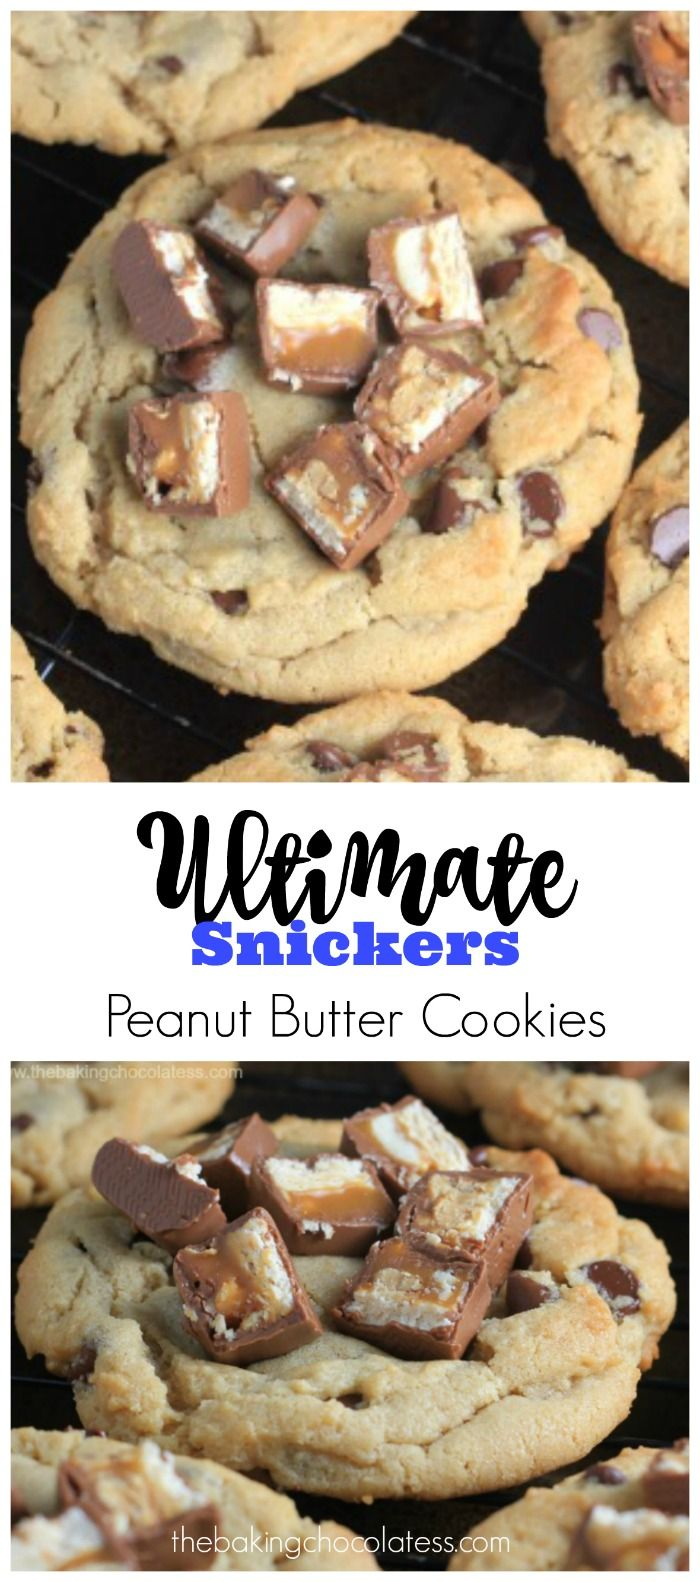 Ultimate Snickers Peanut Butter Cookies via @https://www.pinterest.com/BaknChocolaTess/